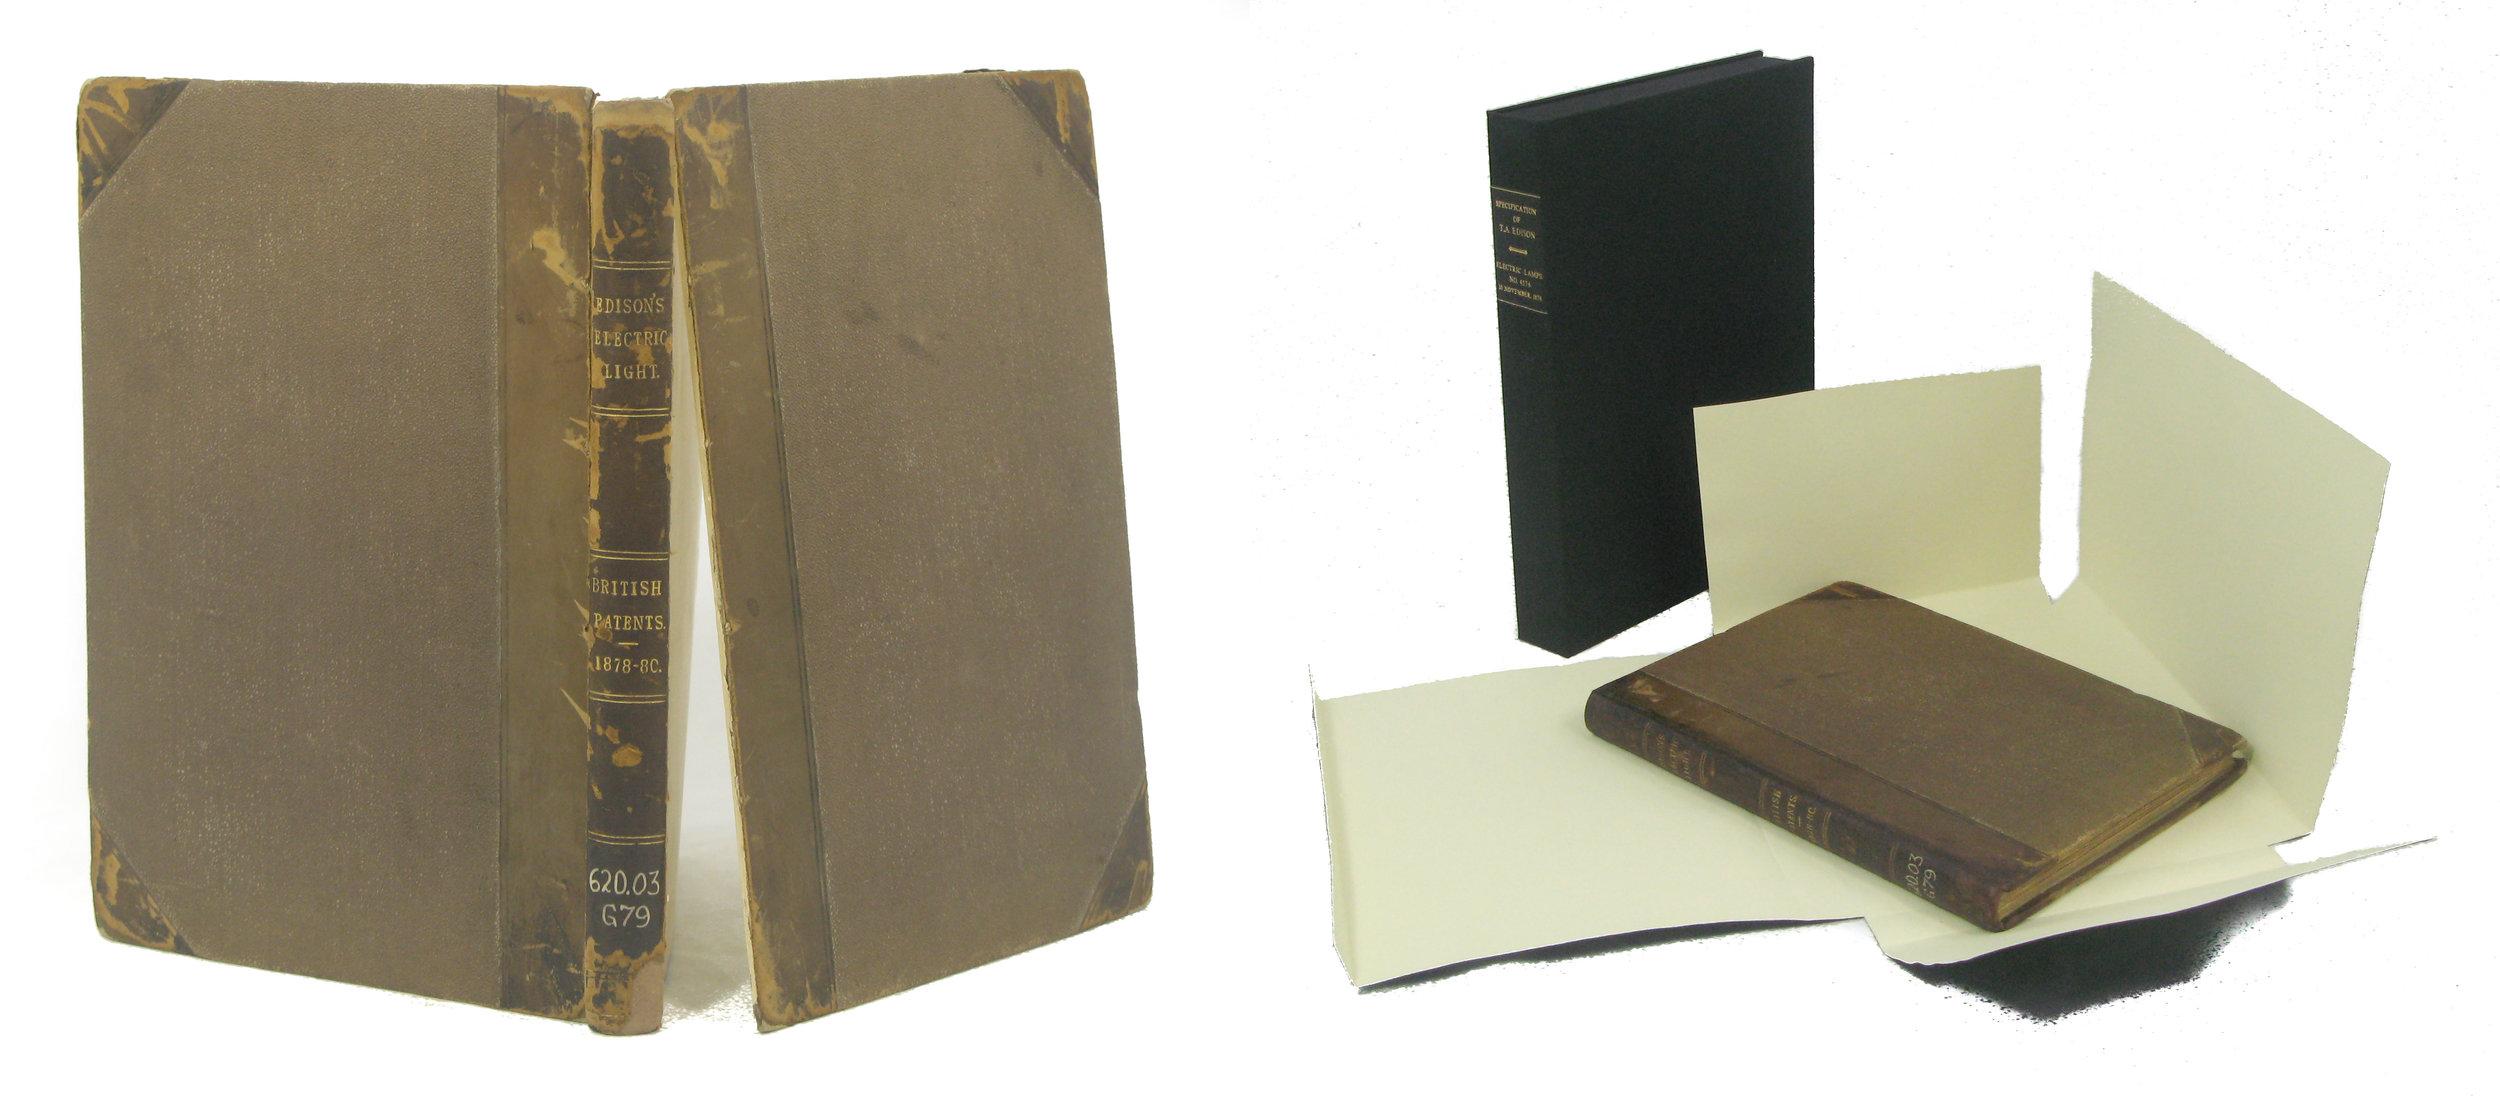 book box chemise.6mb.jpg